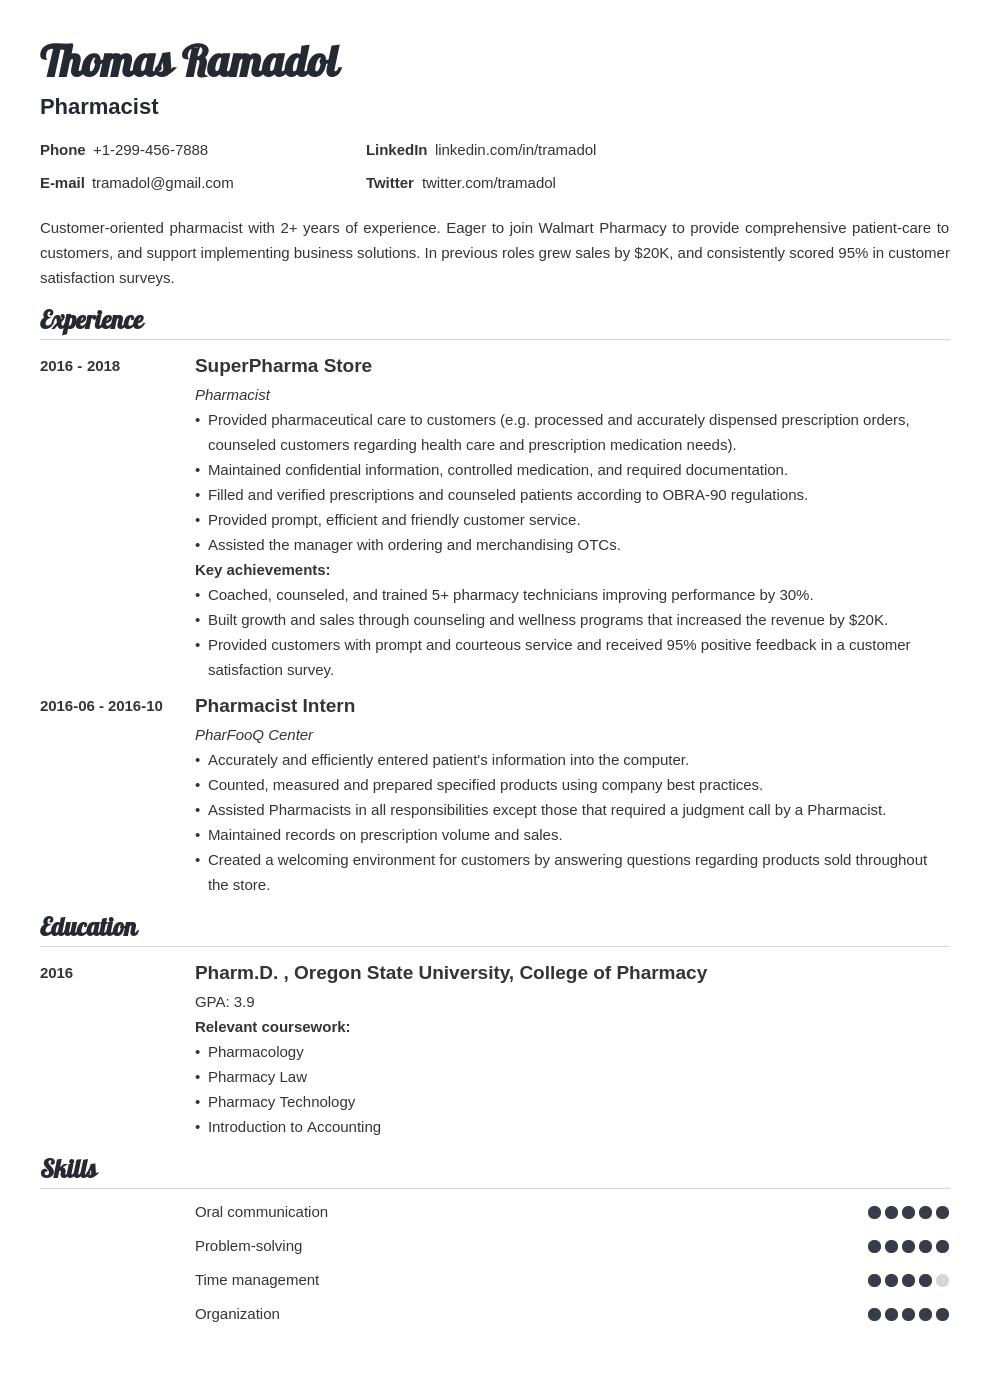 pharmacist template valera uk